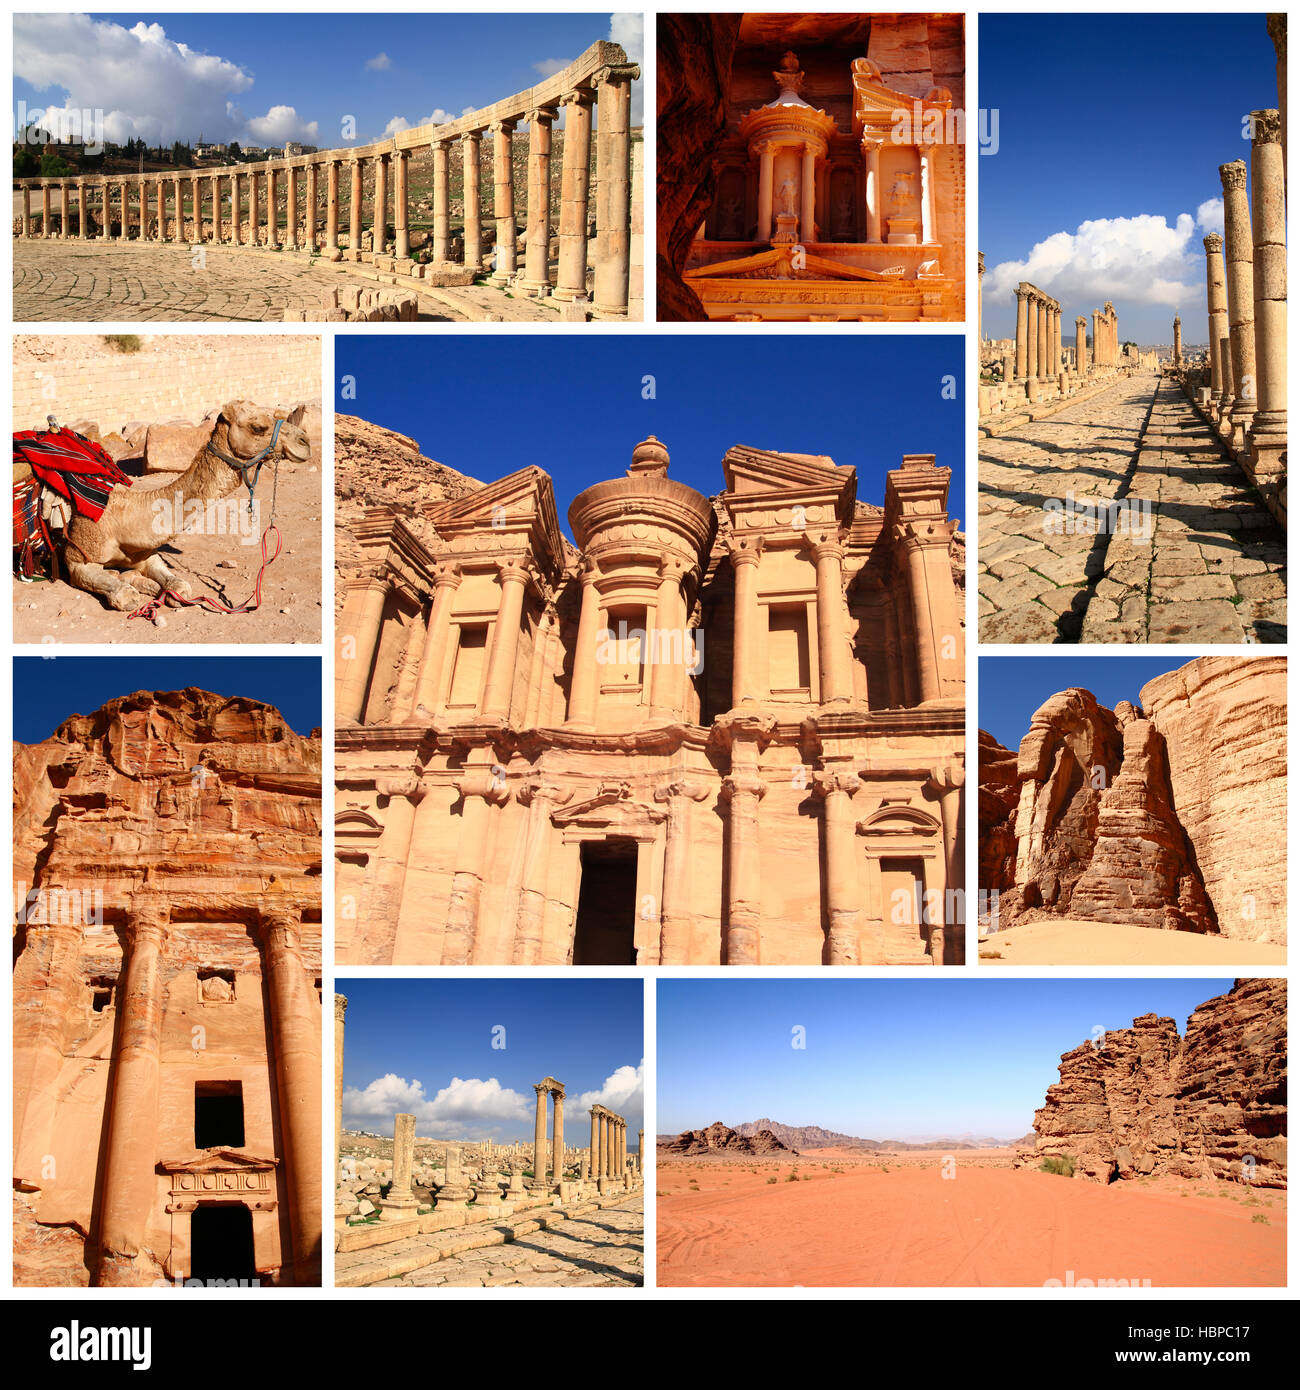 Impressions of Jordan - Stock Image